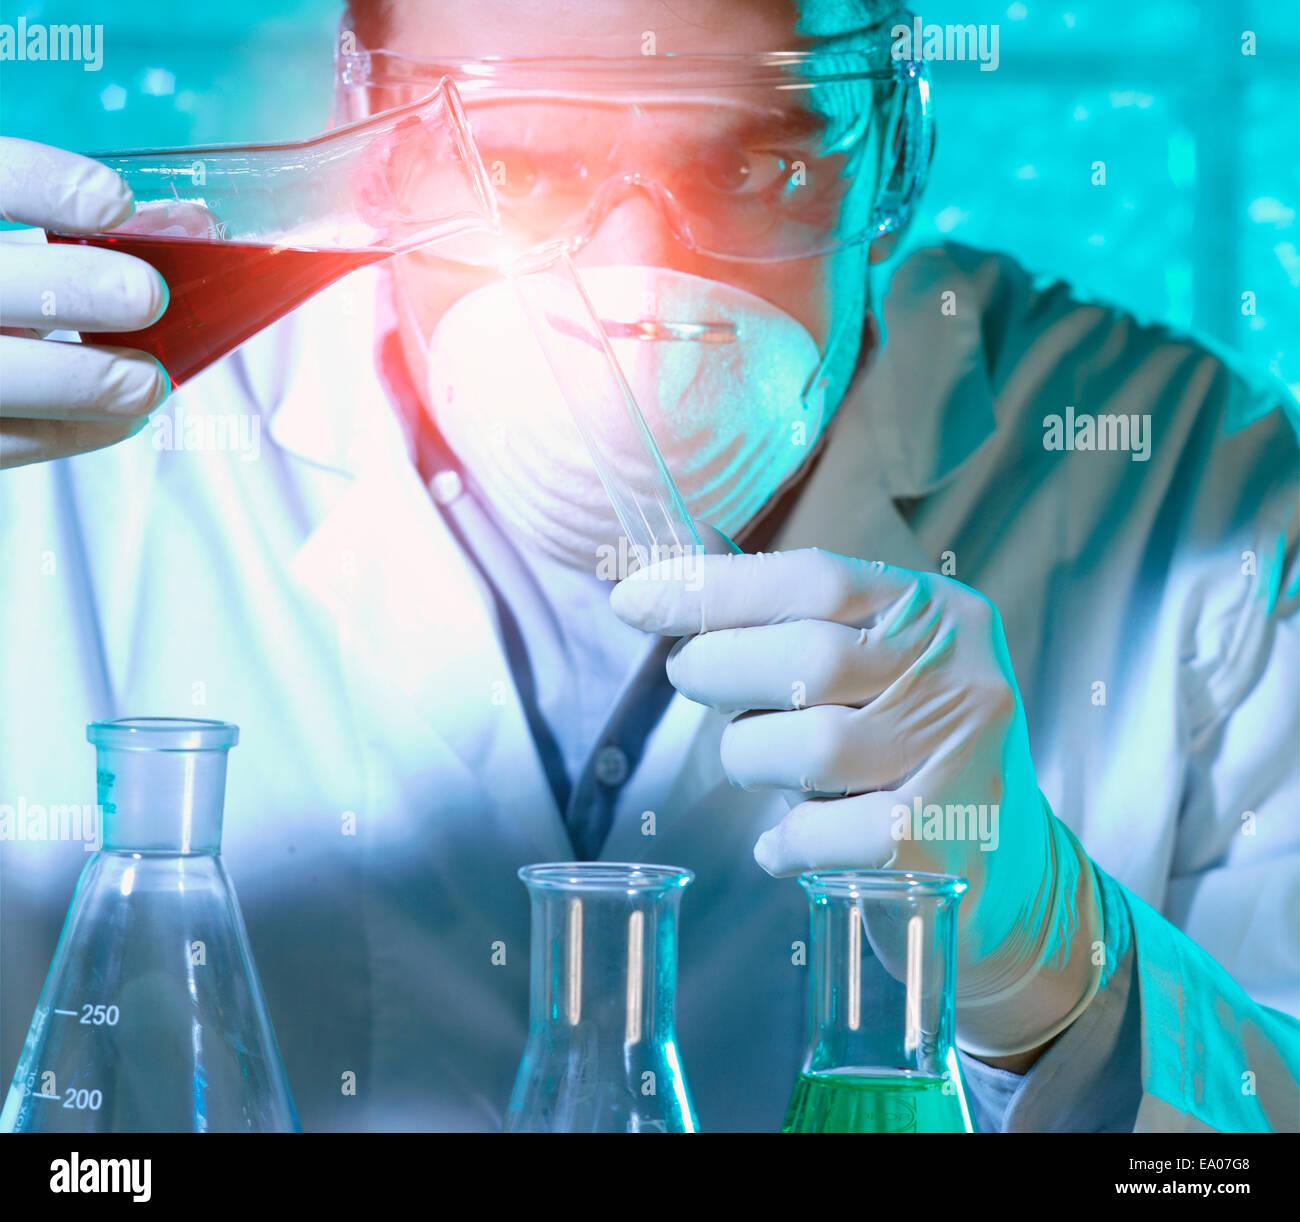 Chemist pouring liquid from beaker into test tube Stock Photo